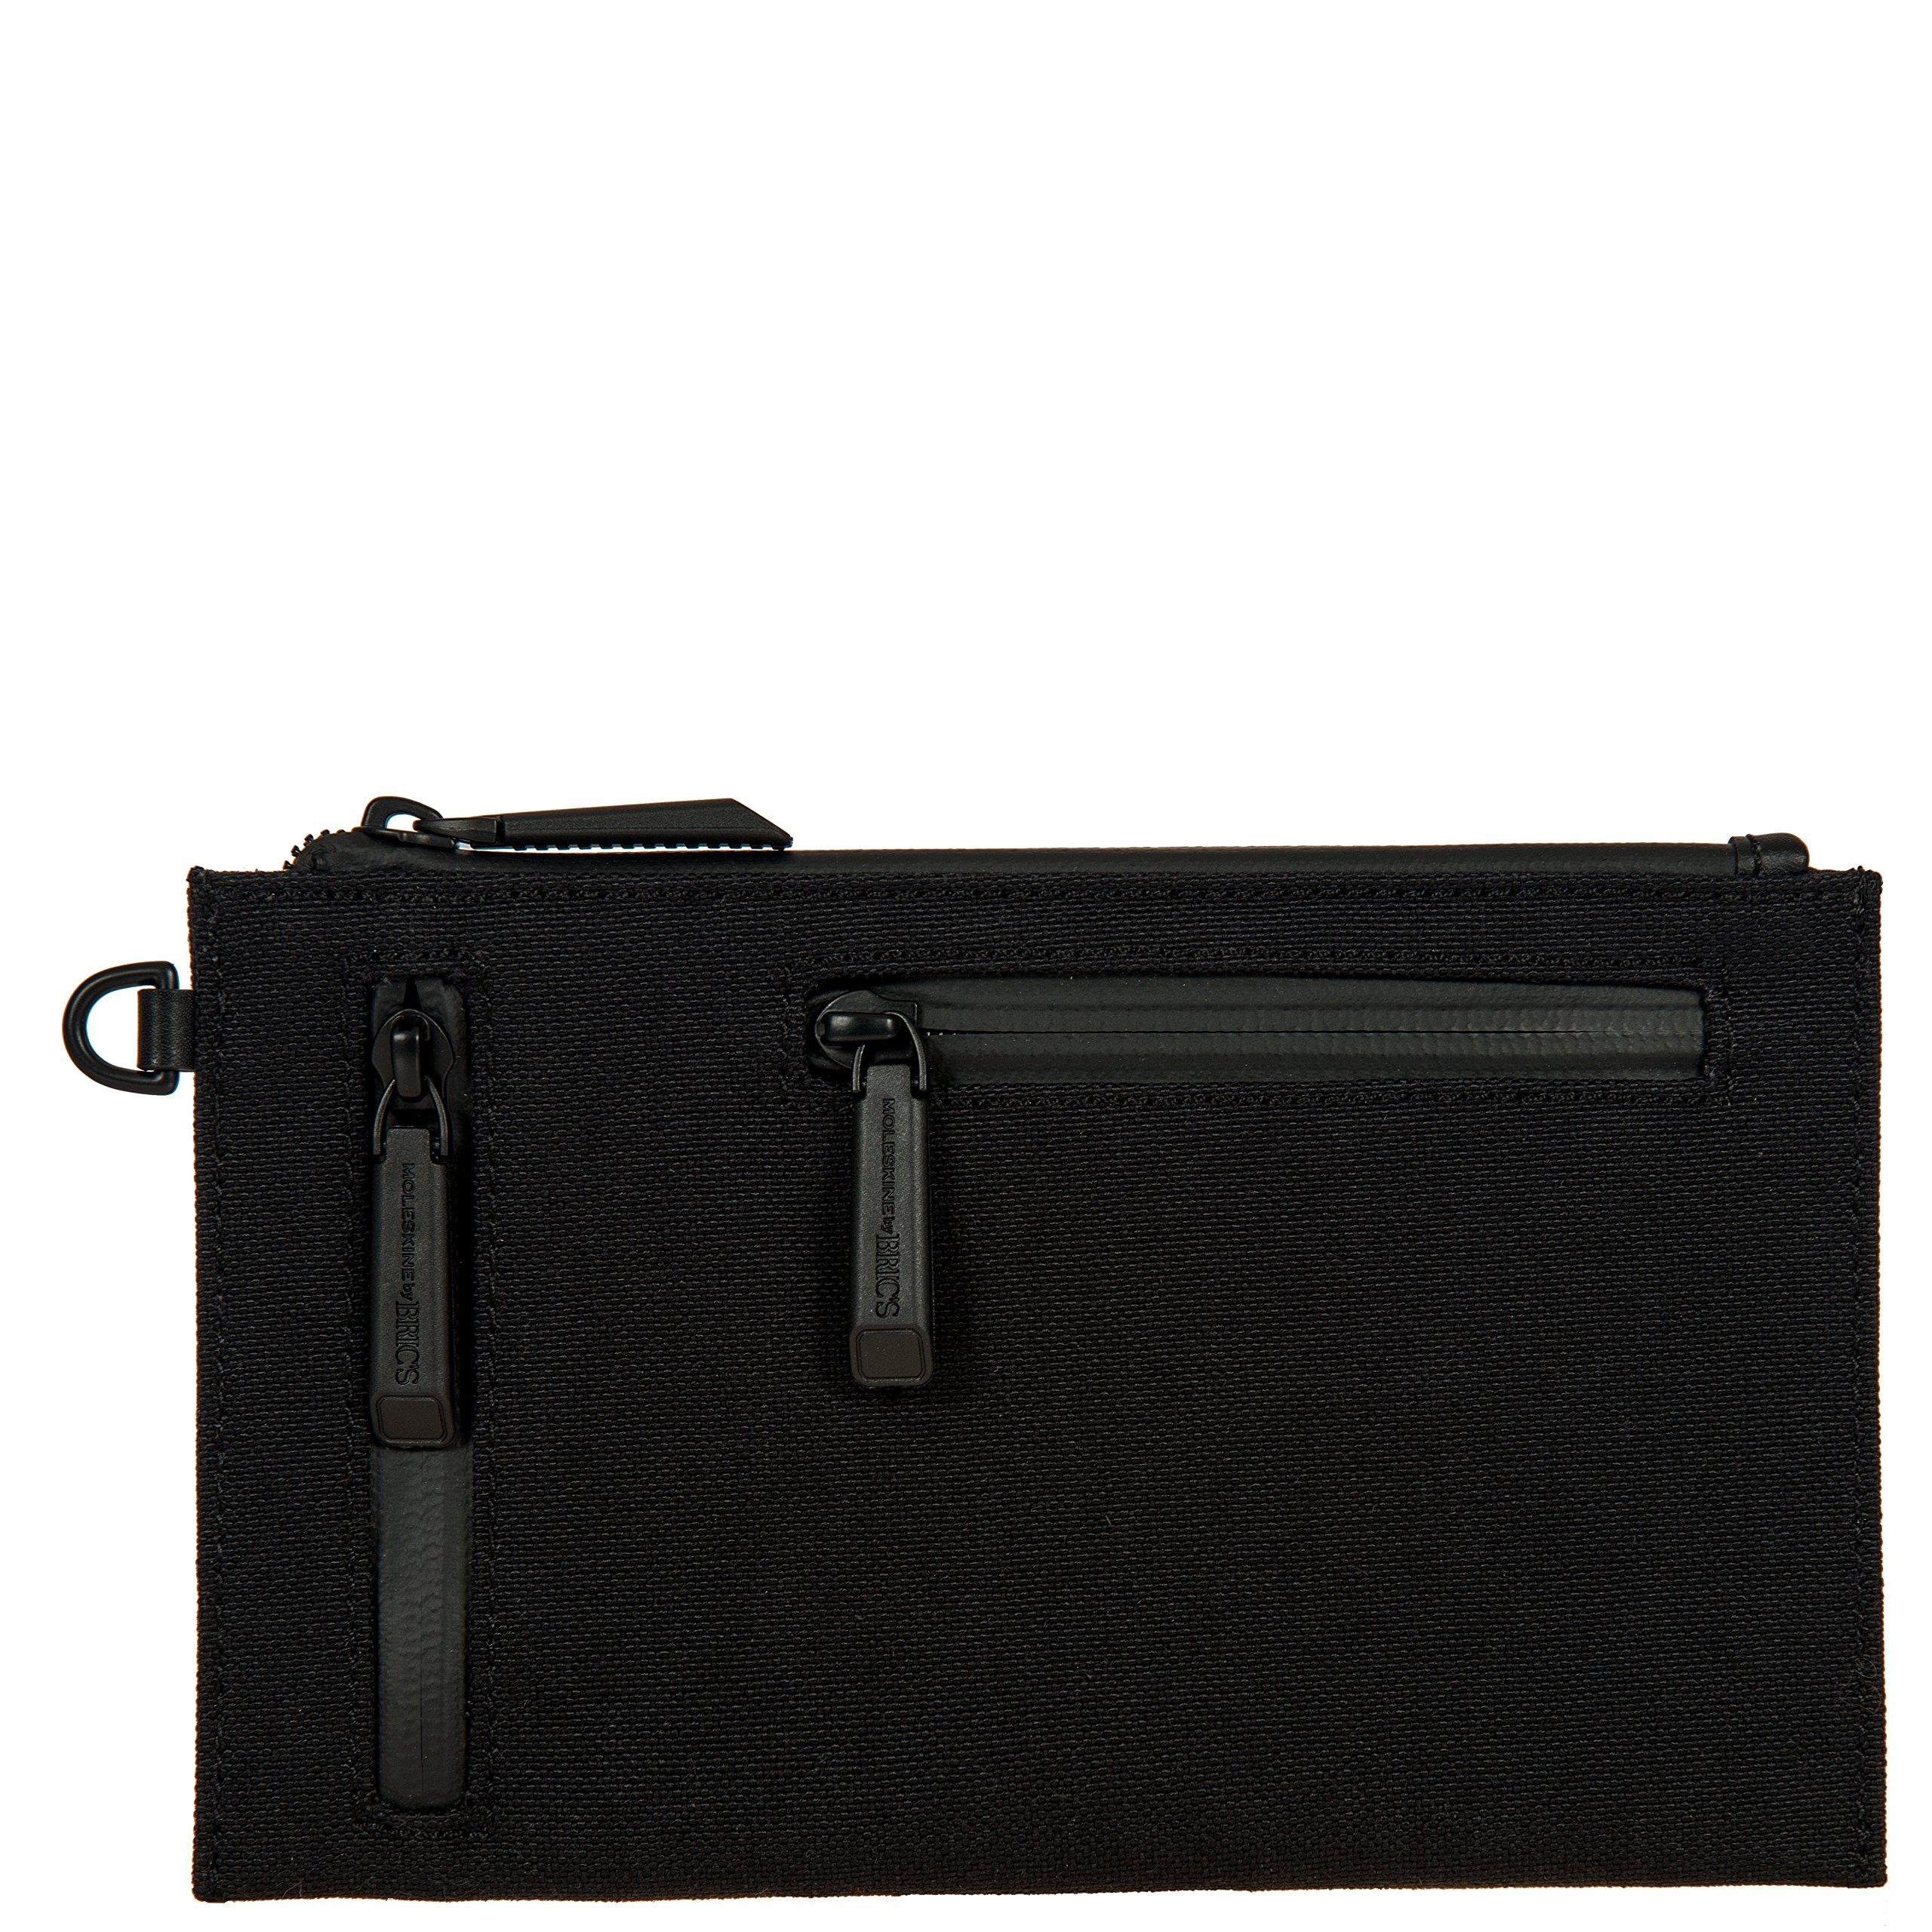 Bric's Men's Moleskine RFID Pouch, Black